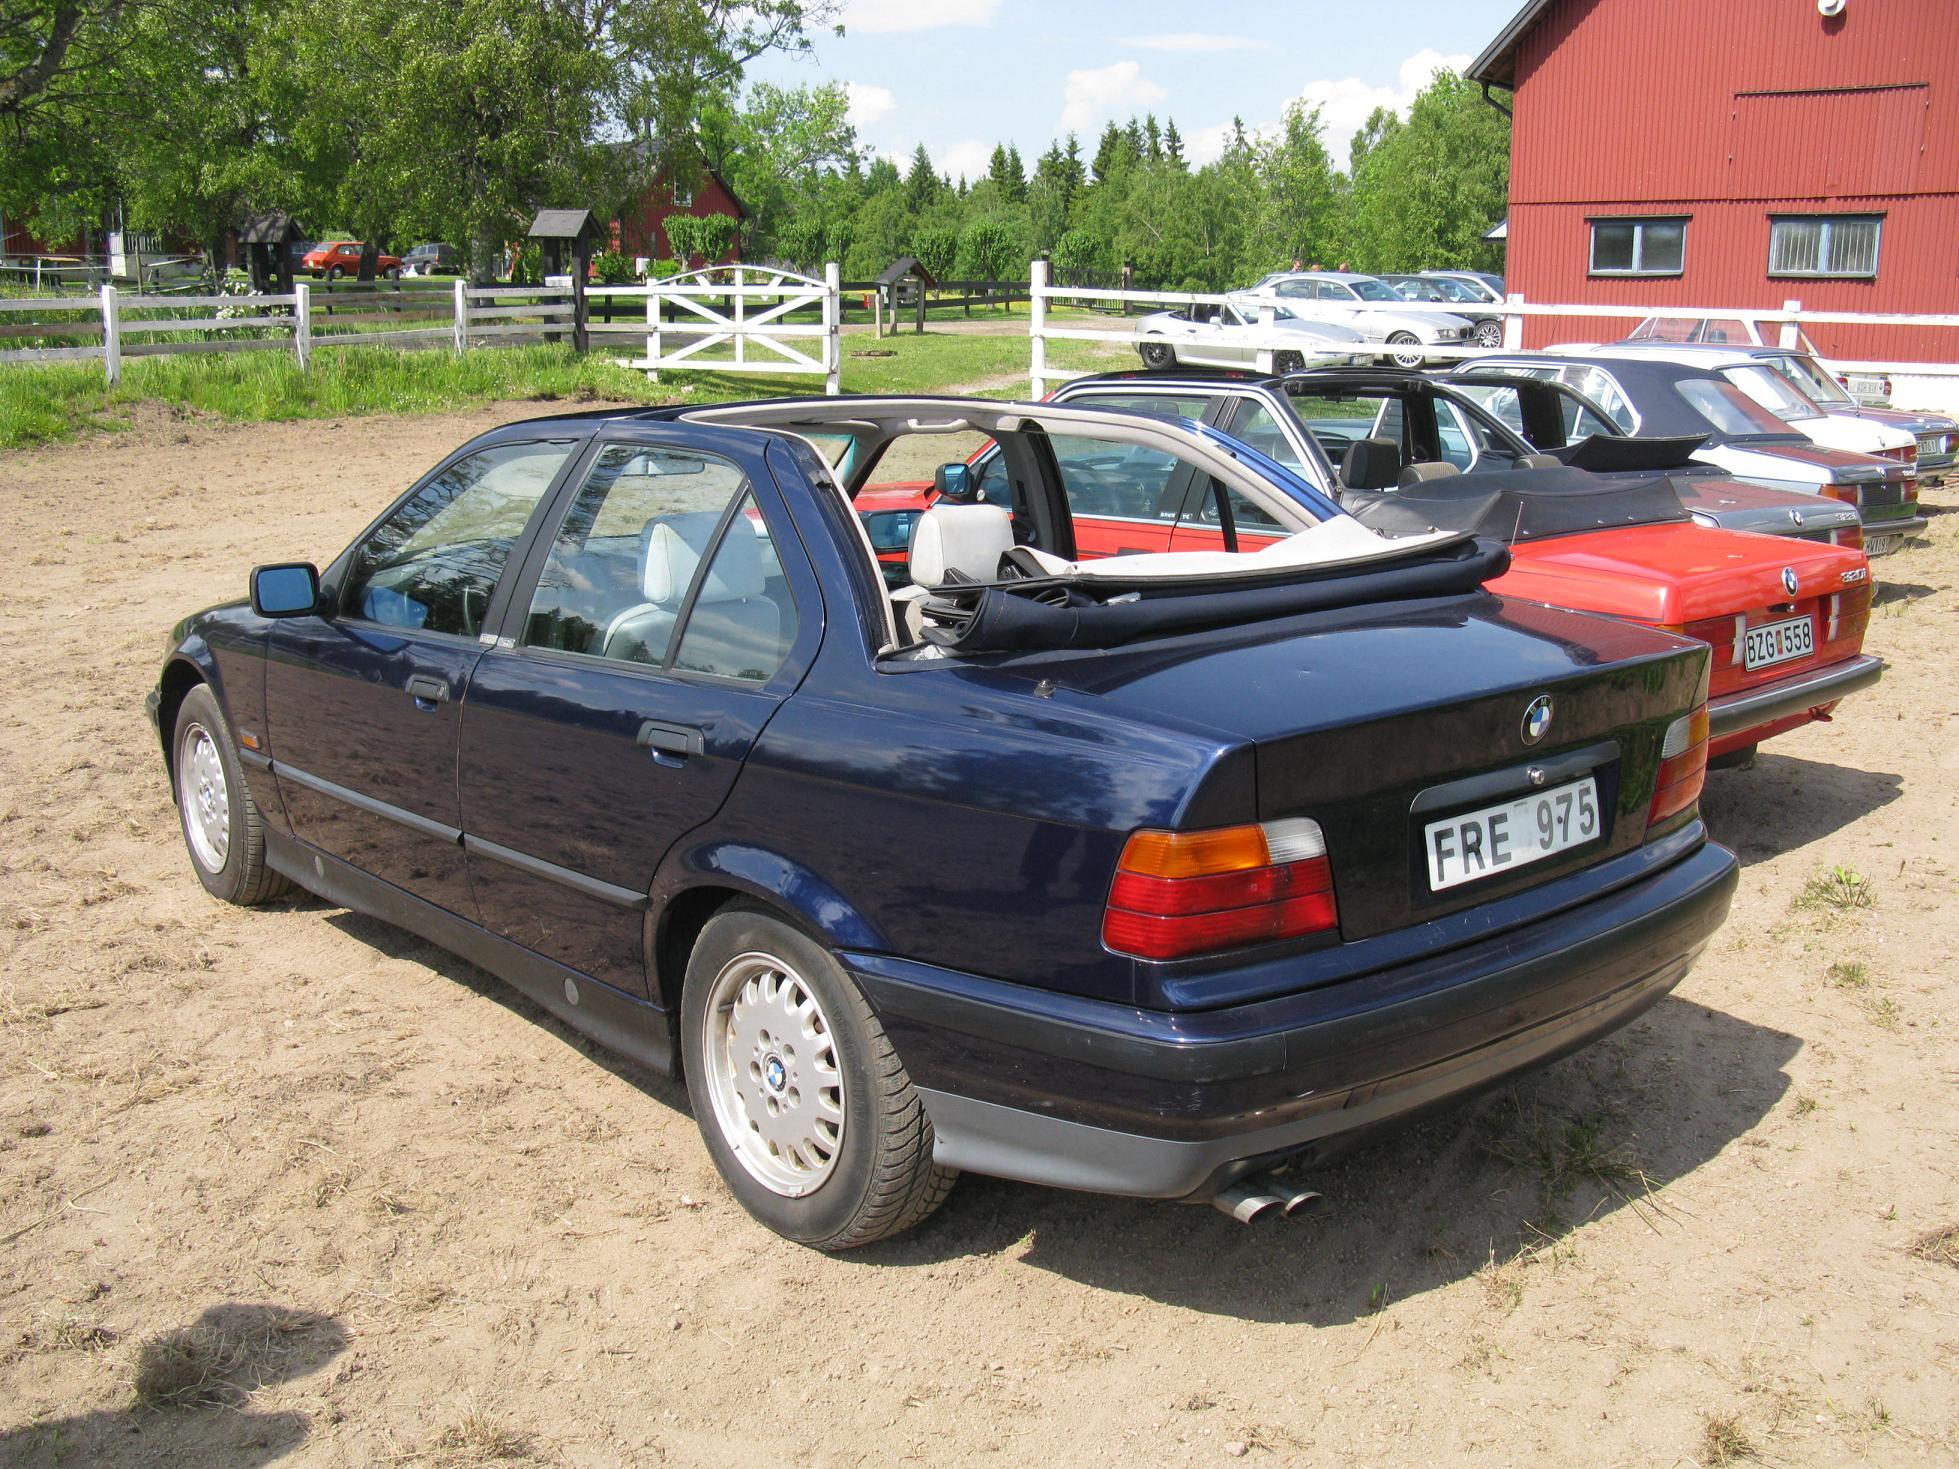 Filebmw 325i Baur Cabriolet E36 5917922649jpg Wikimedia Commons